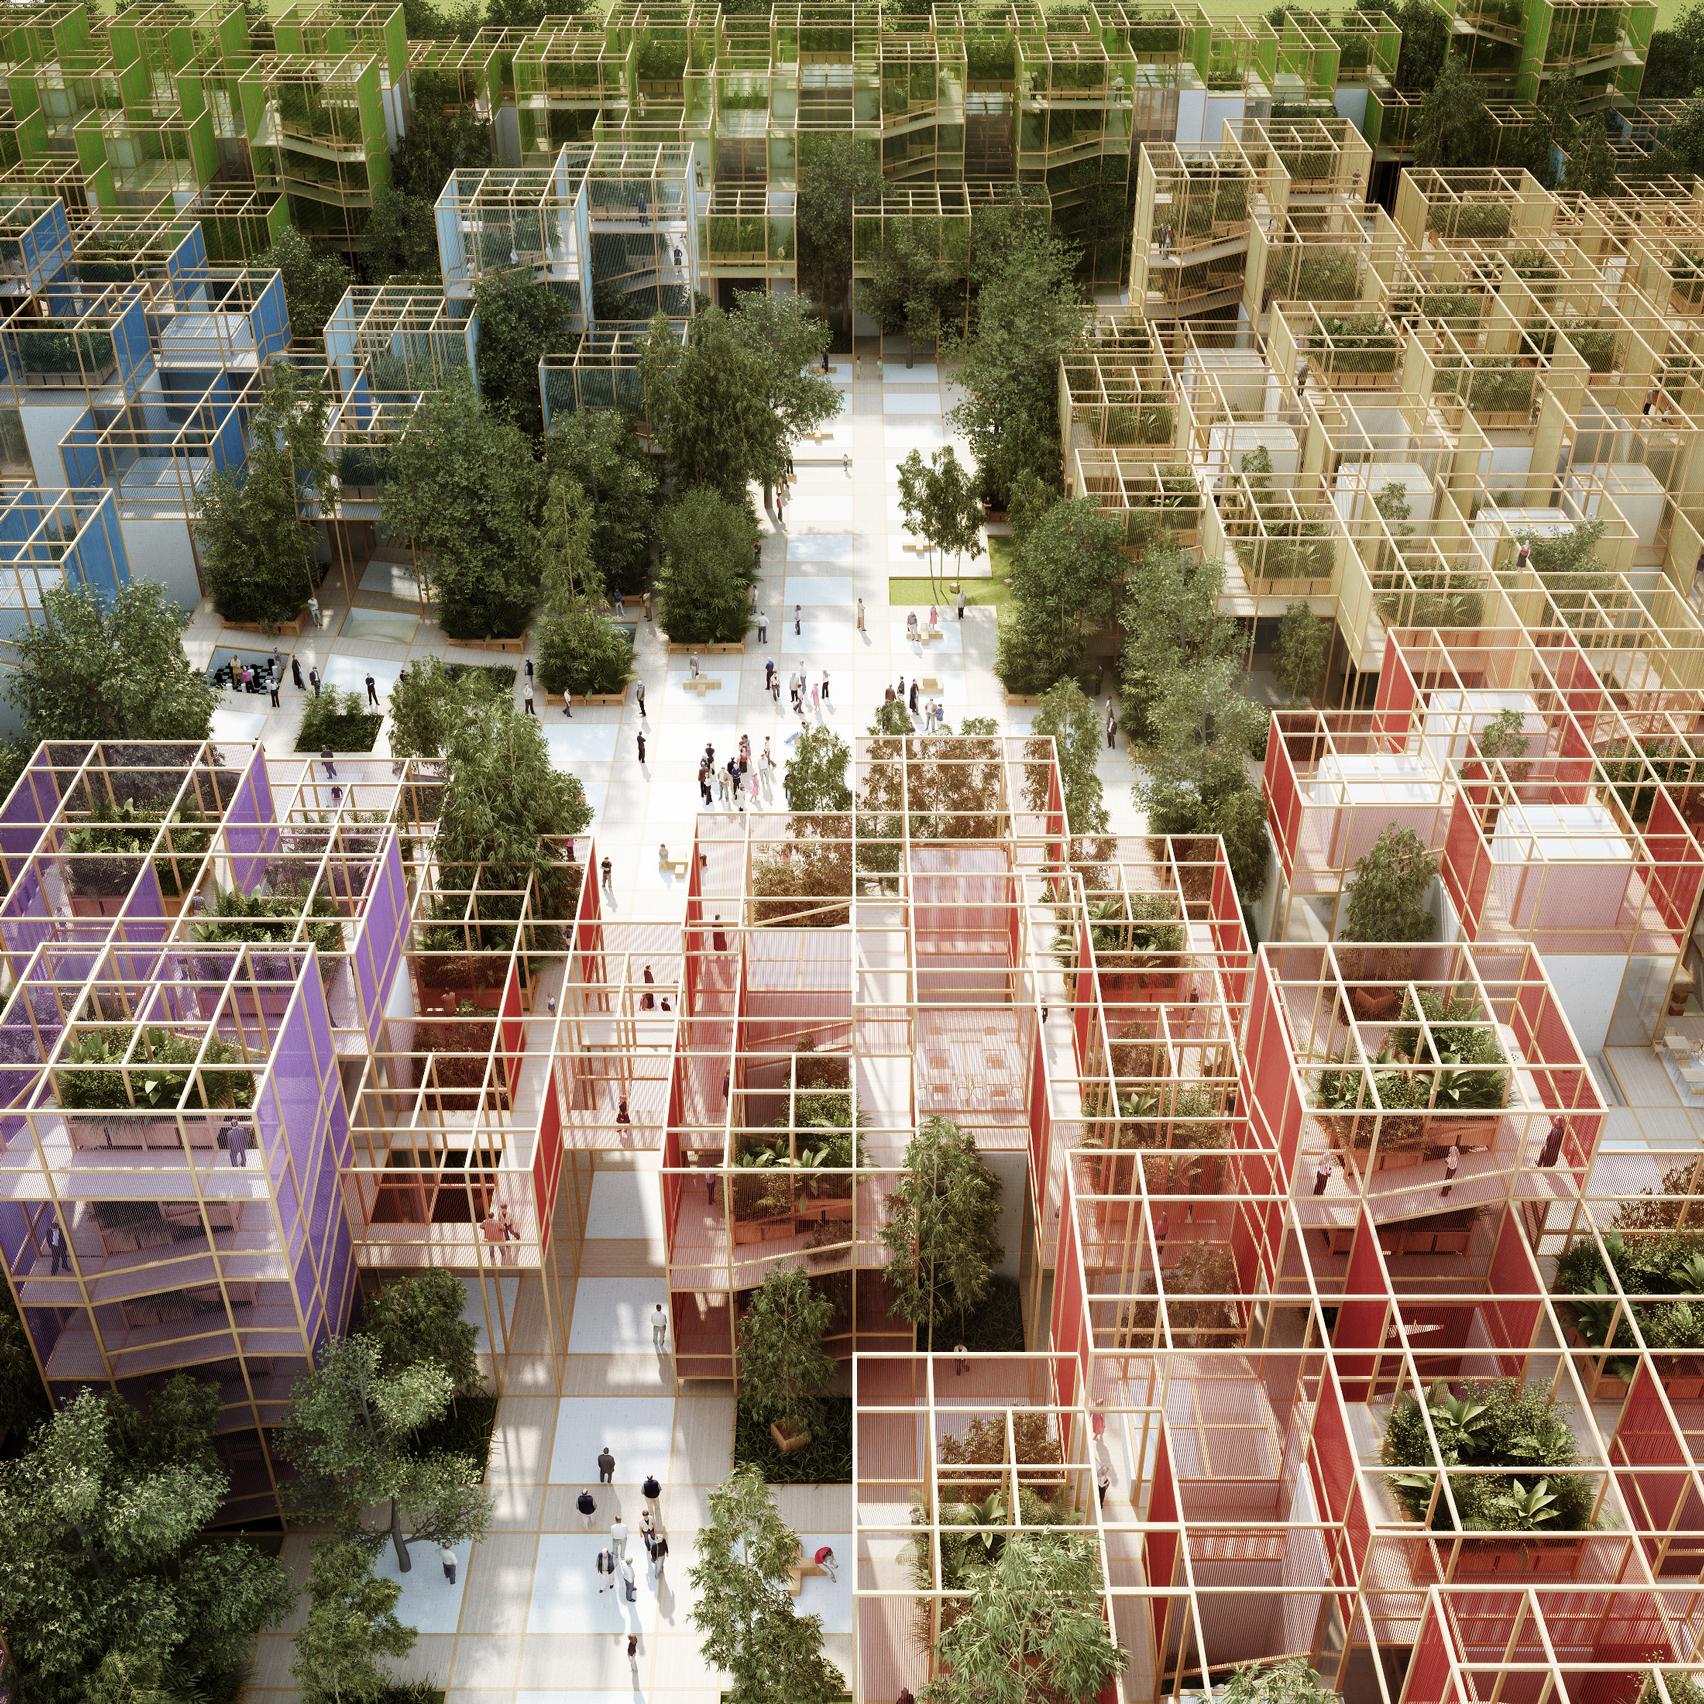 Penda Designs Modular Wooden Village For Beijing Horticultural Expo